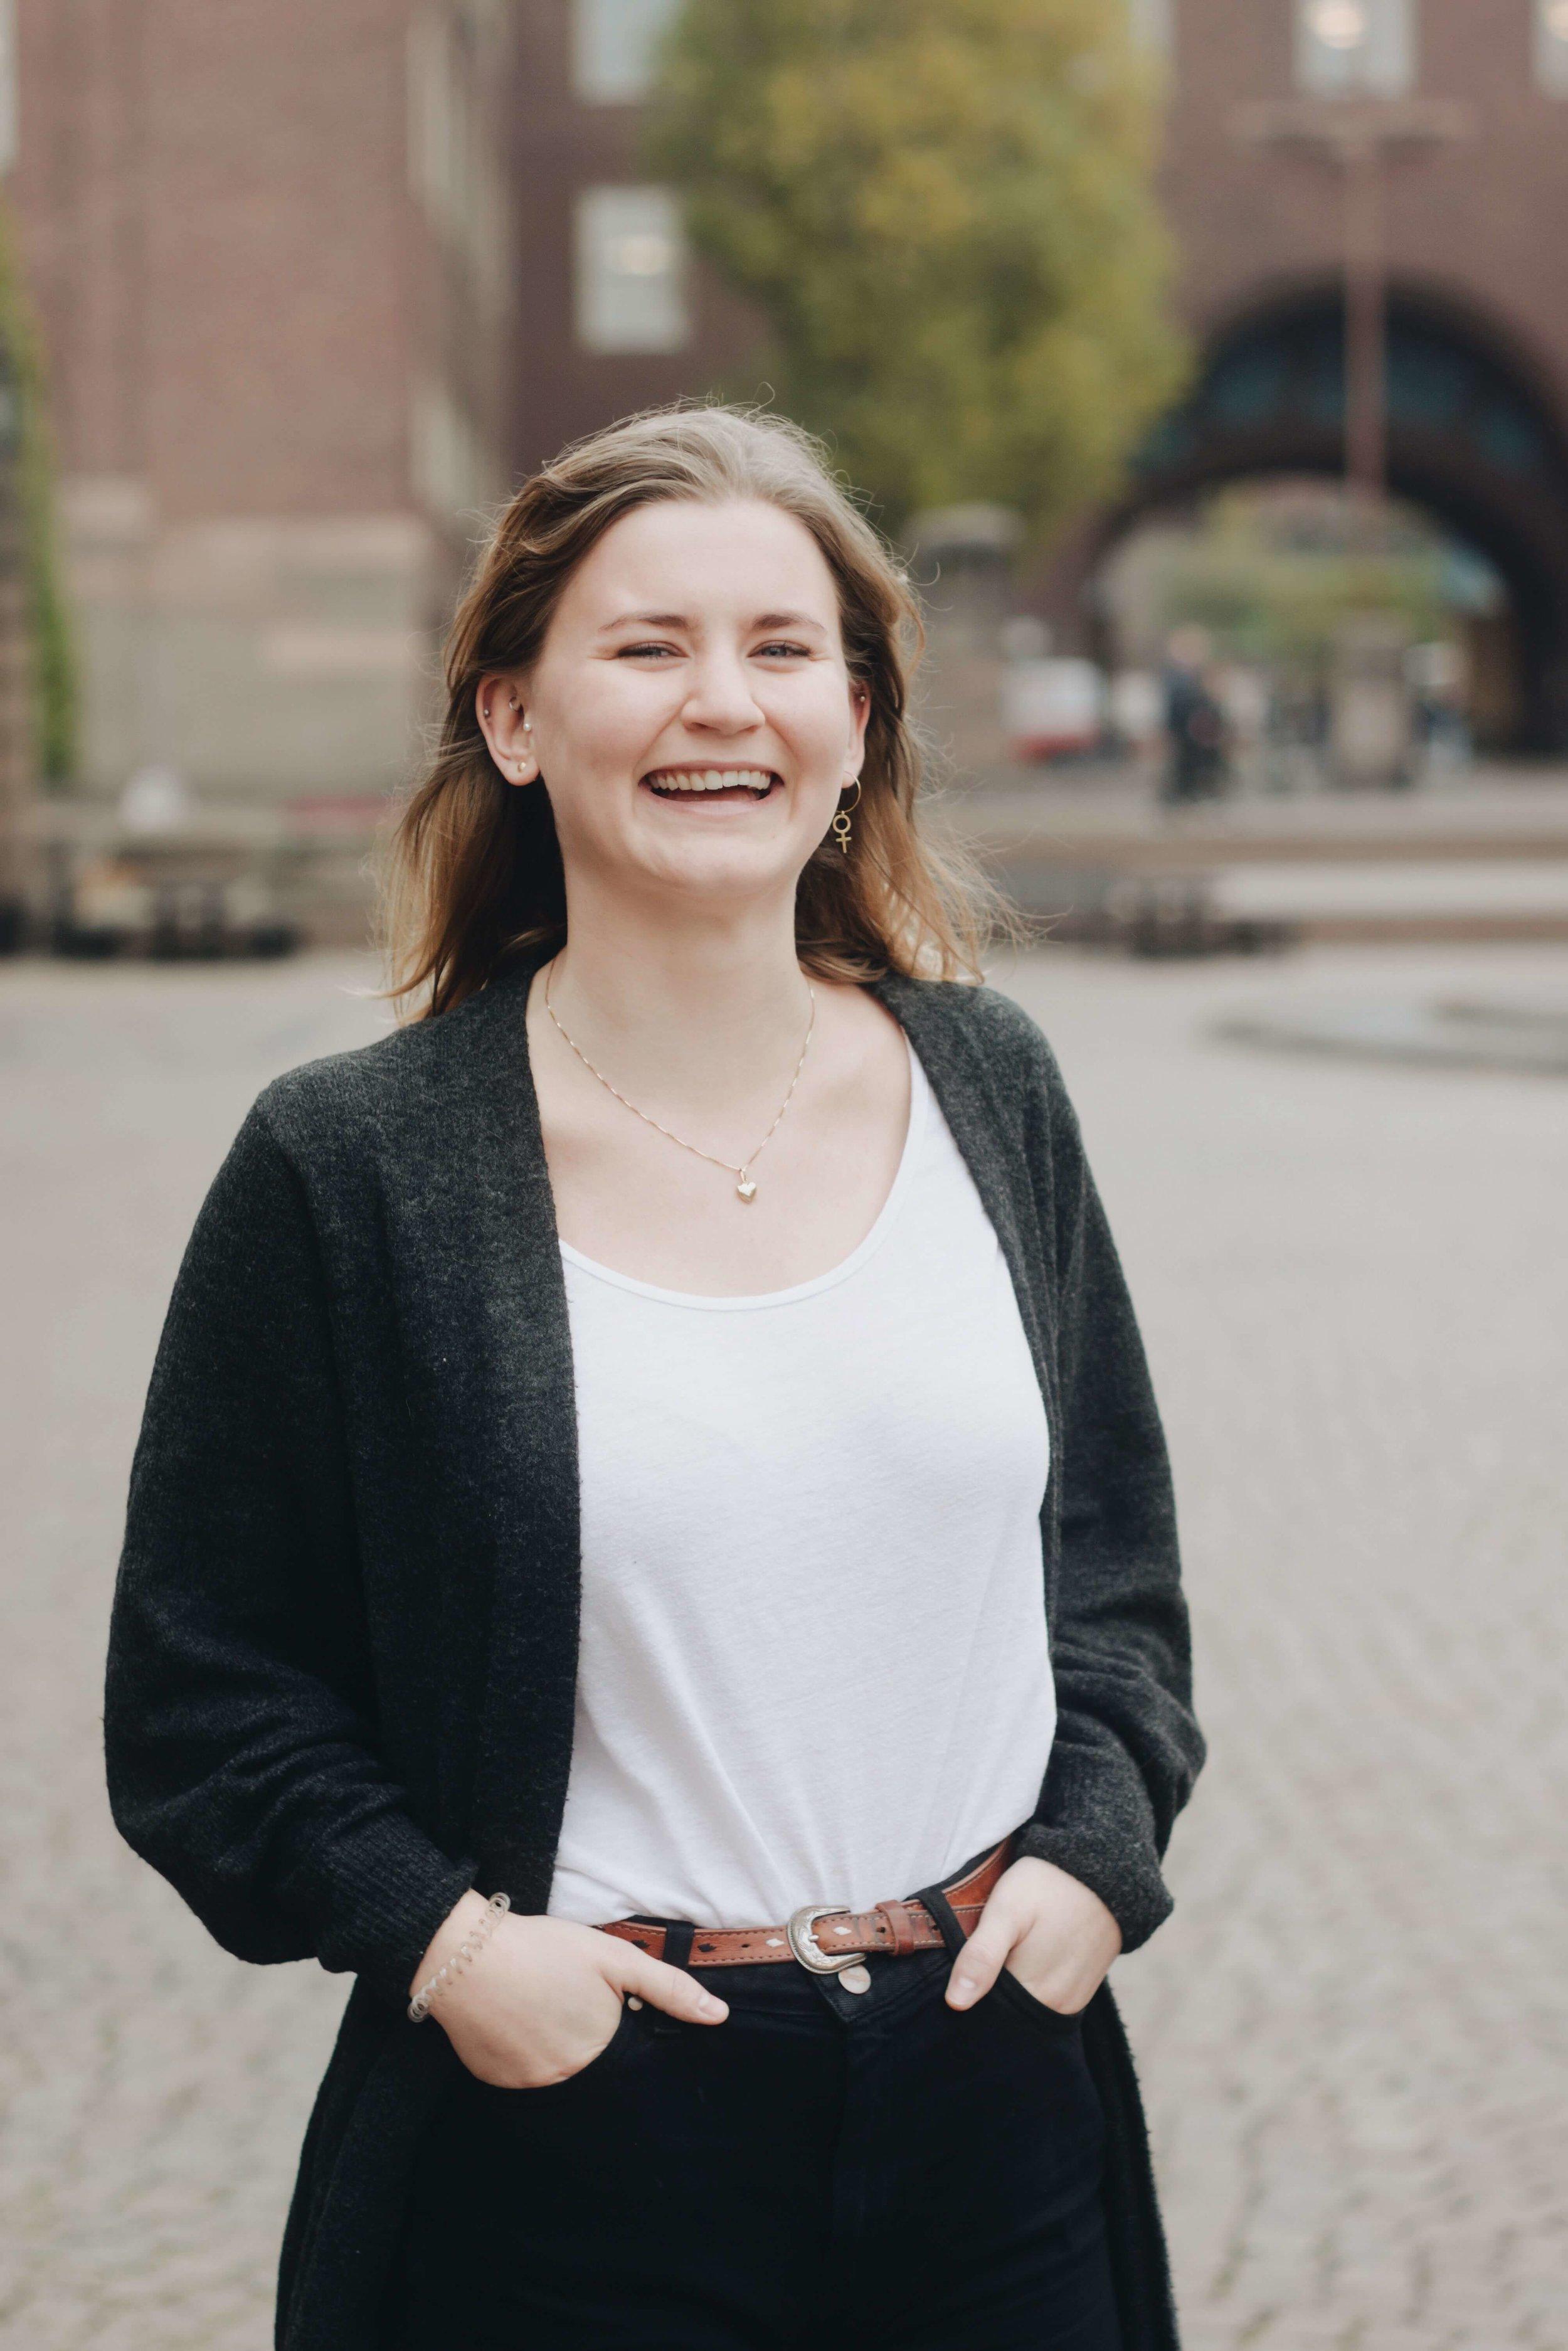 Marika Westman, Social Media Manager